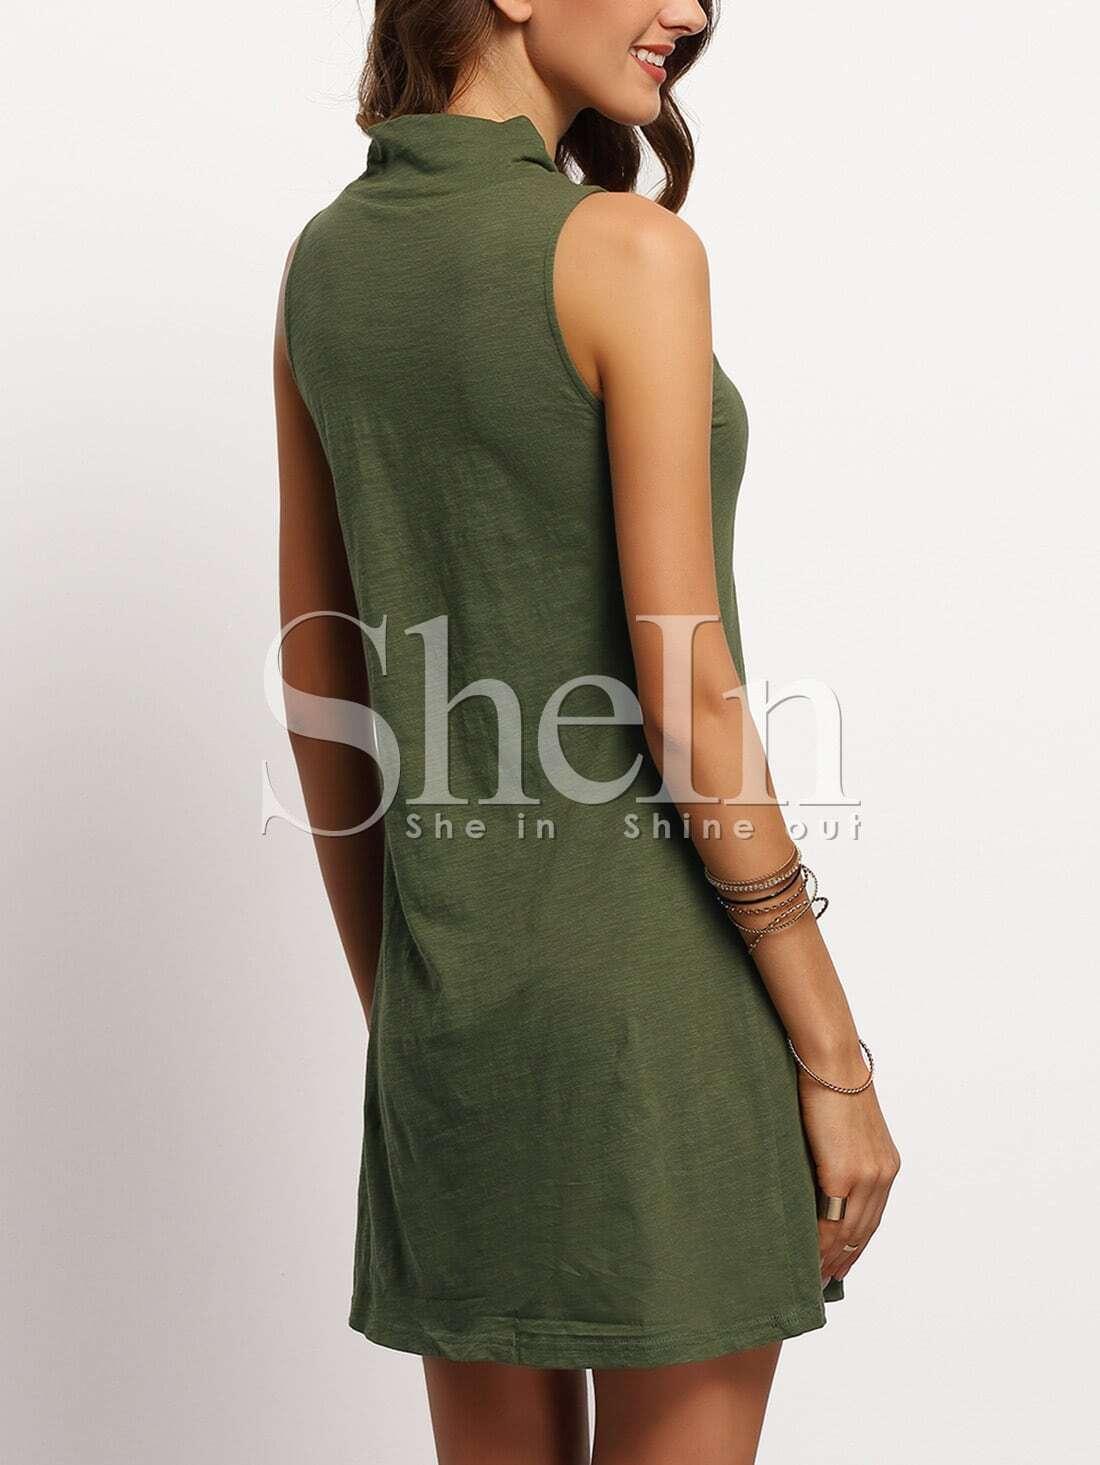 Blackish Green Mock Neck Sleeveless T Shirt Dress Shein